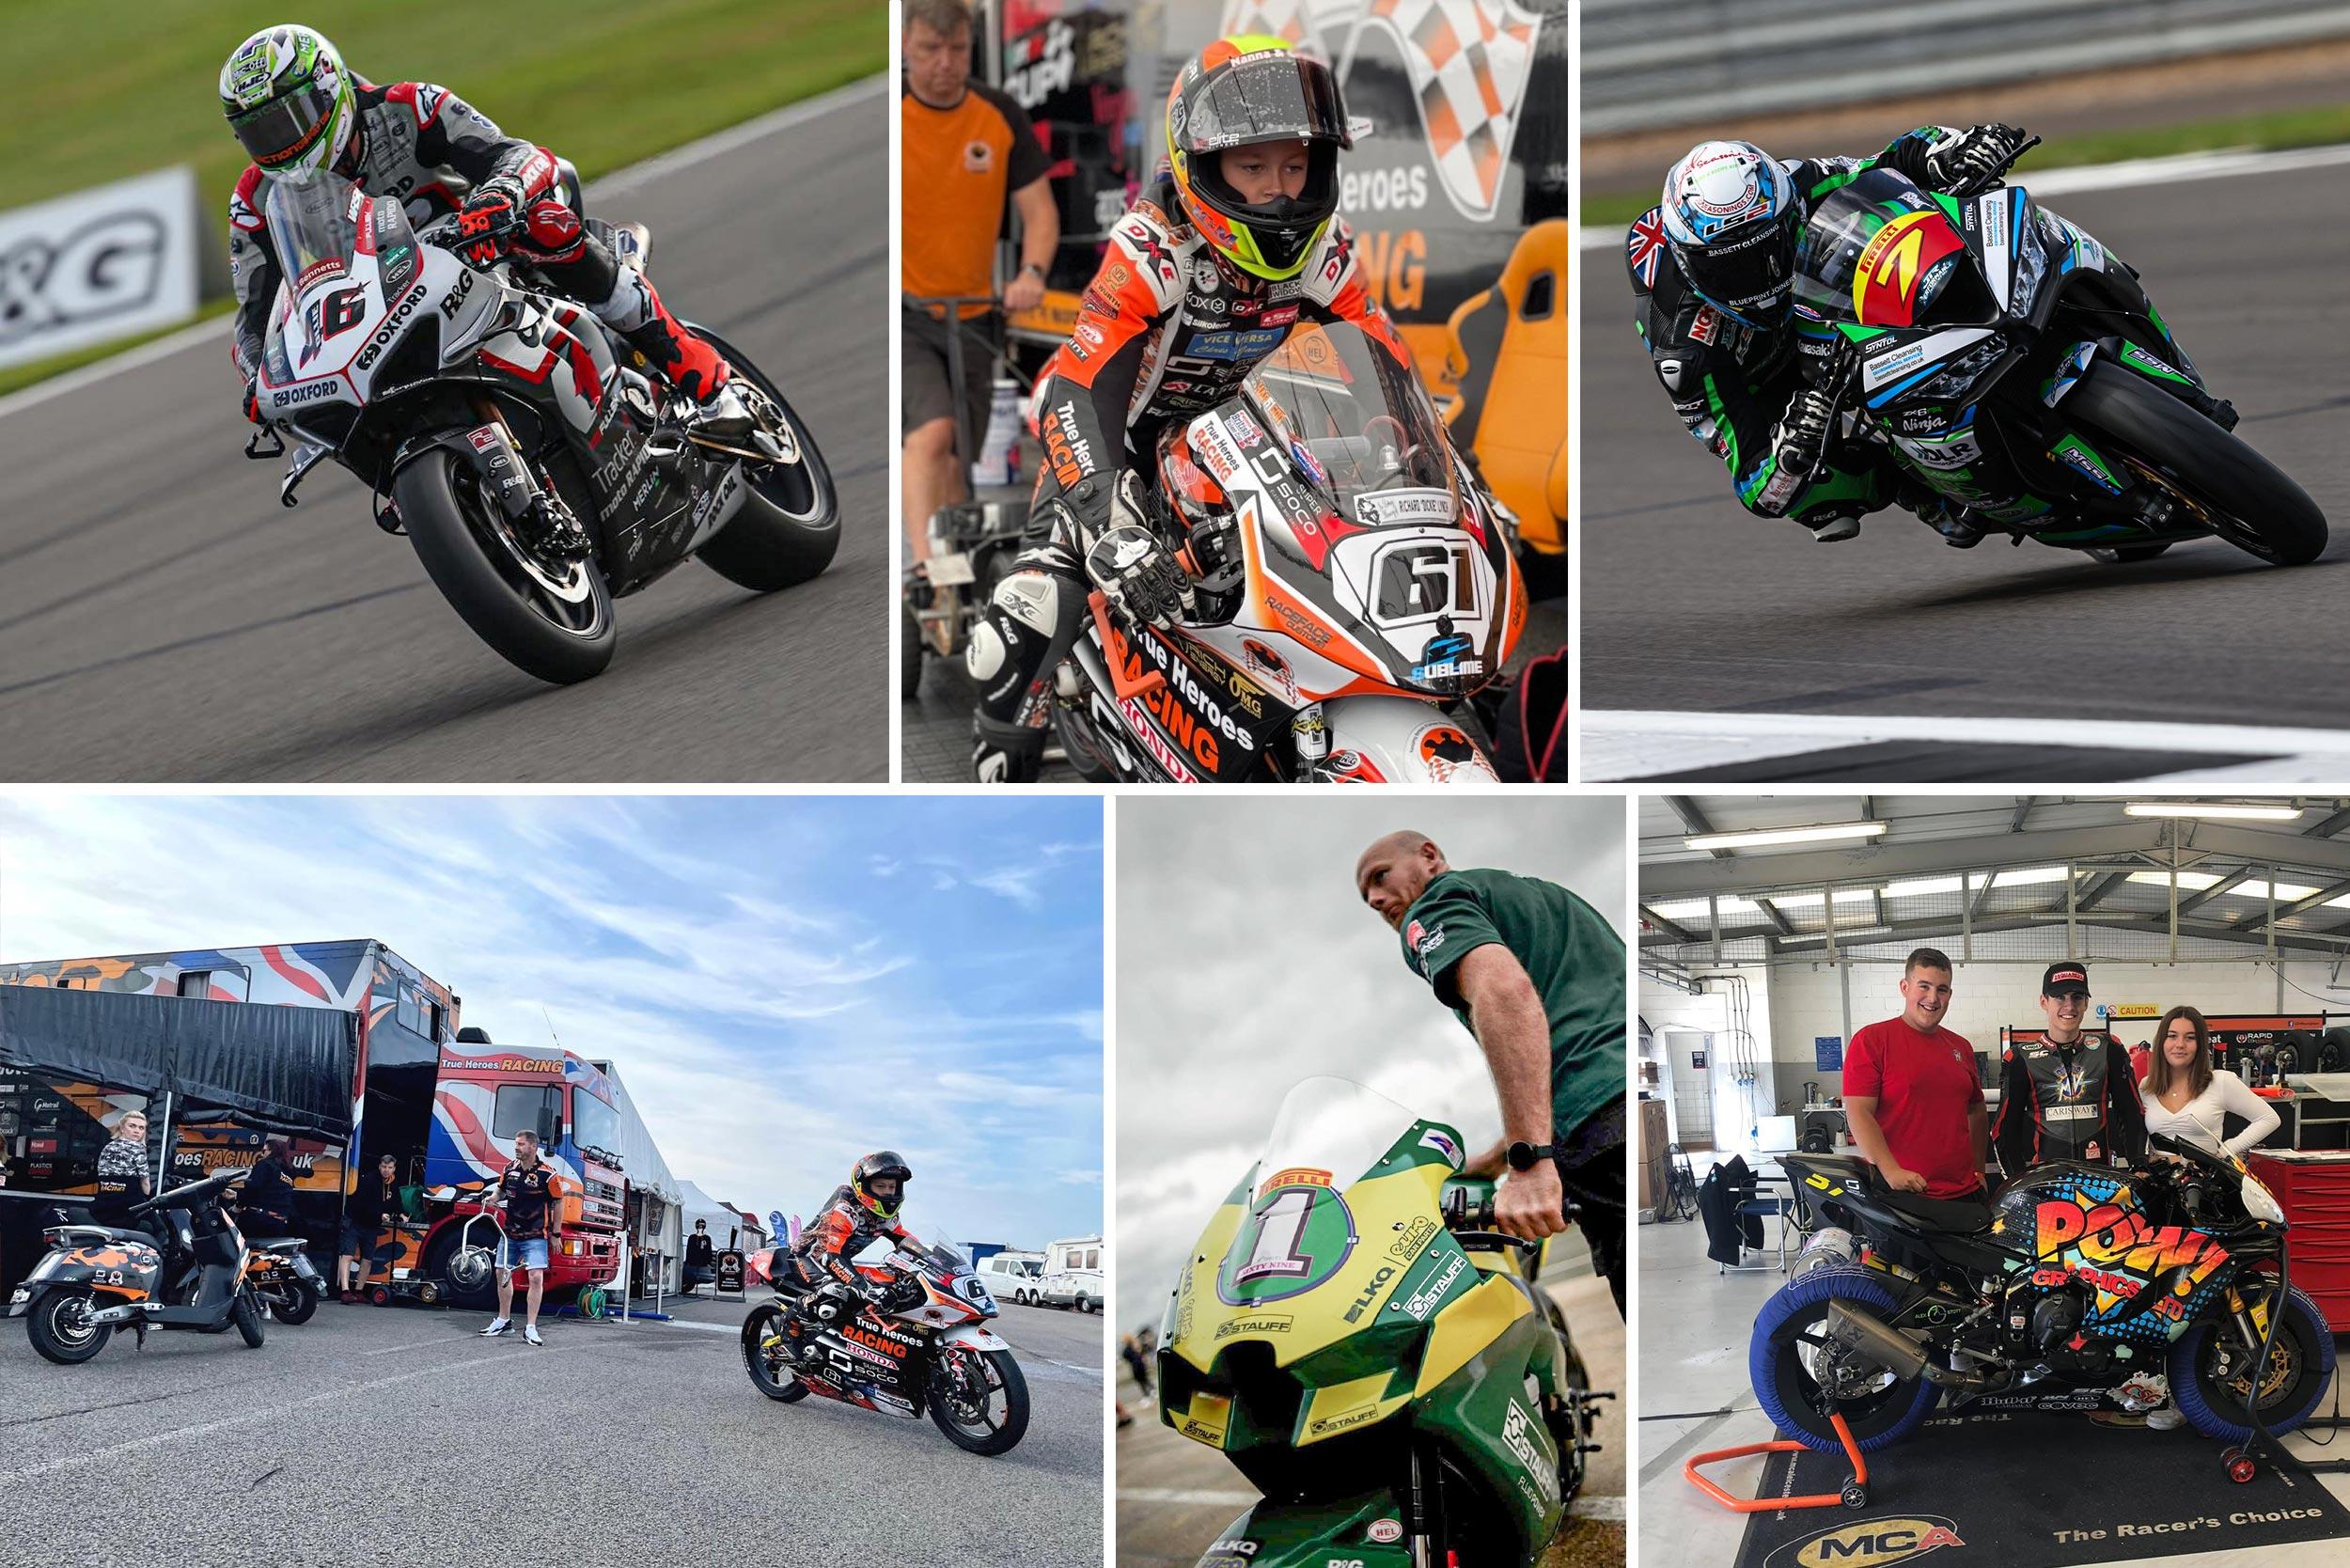 Super Soco riders at Silverstone BSB